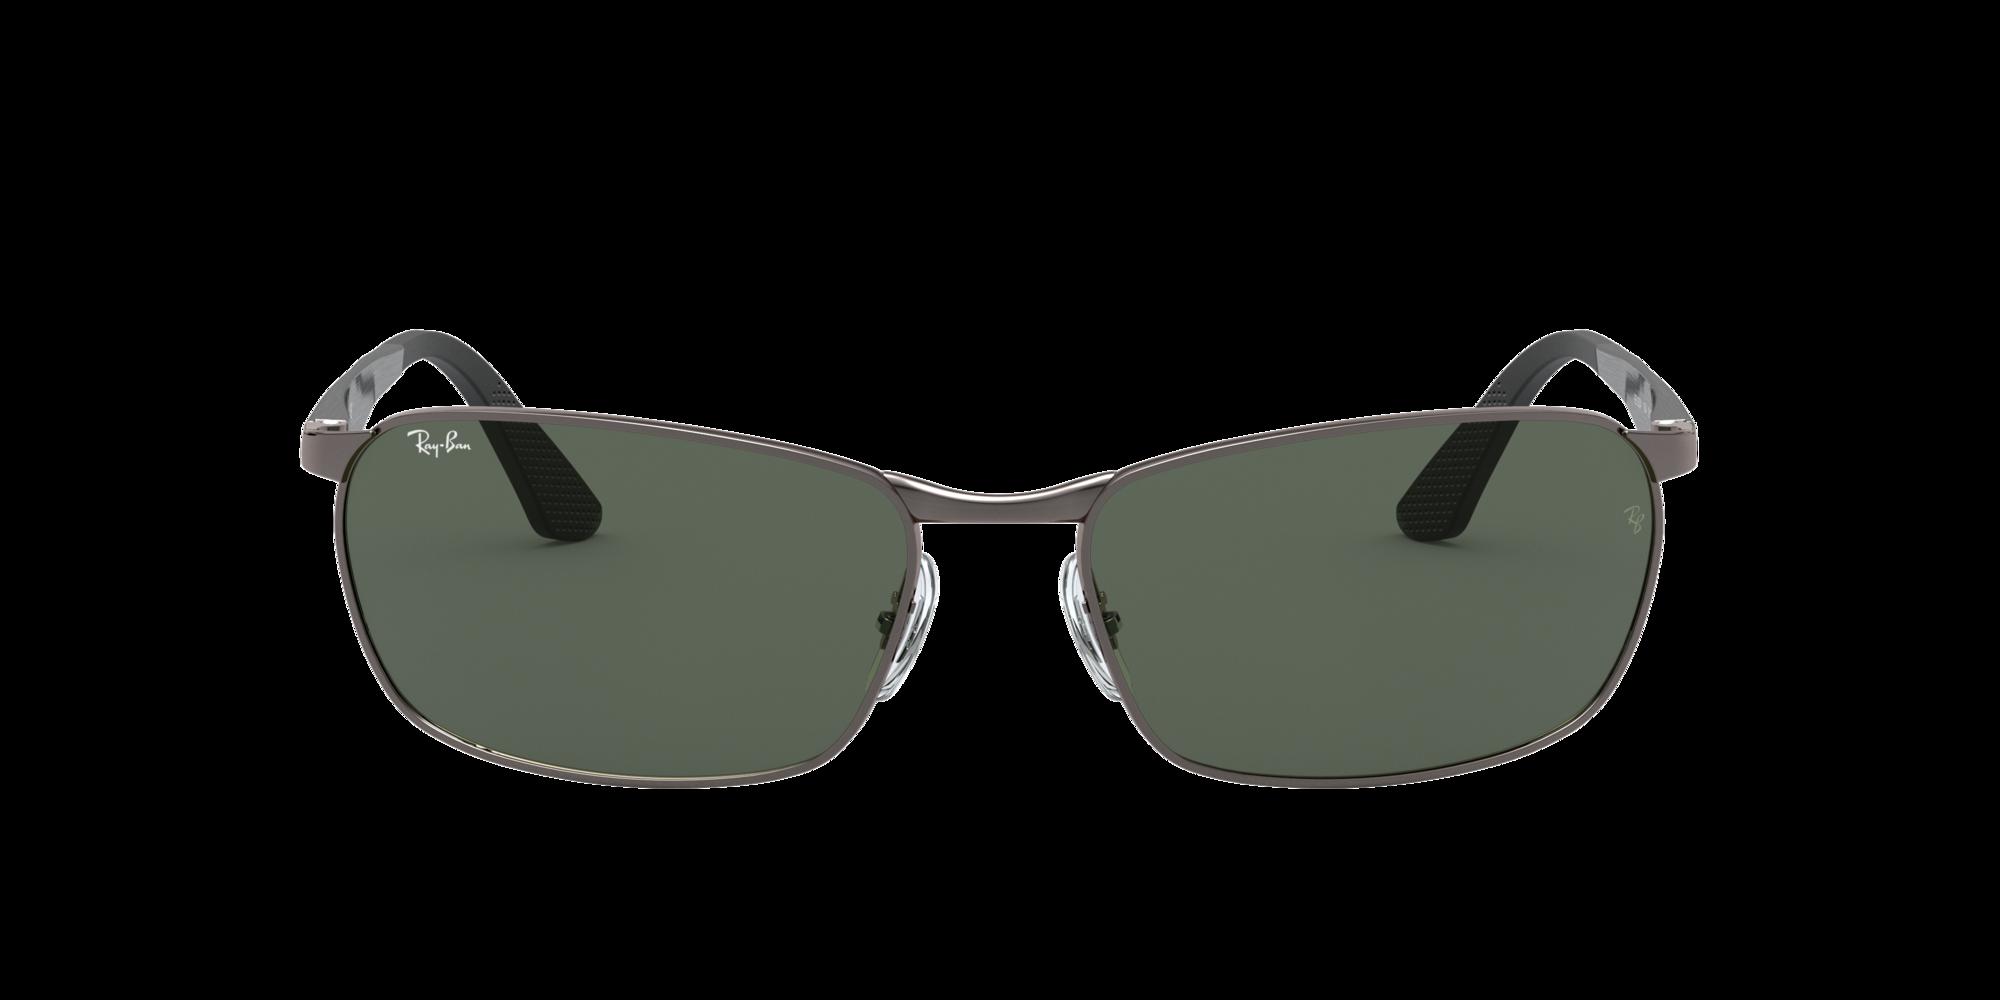 Image for RB3534 59 from LensCrafters | Glasses, Prescription Glasses Online, Eyewear